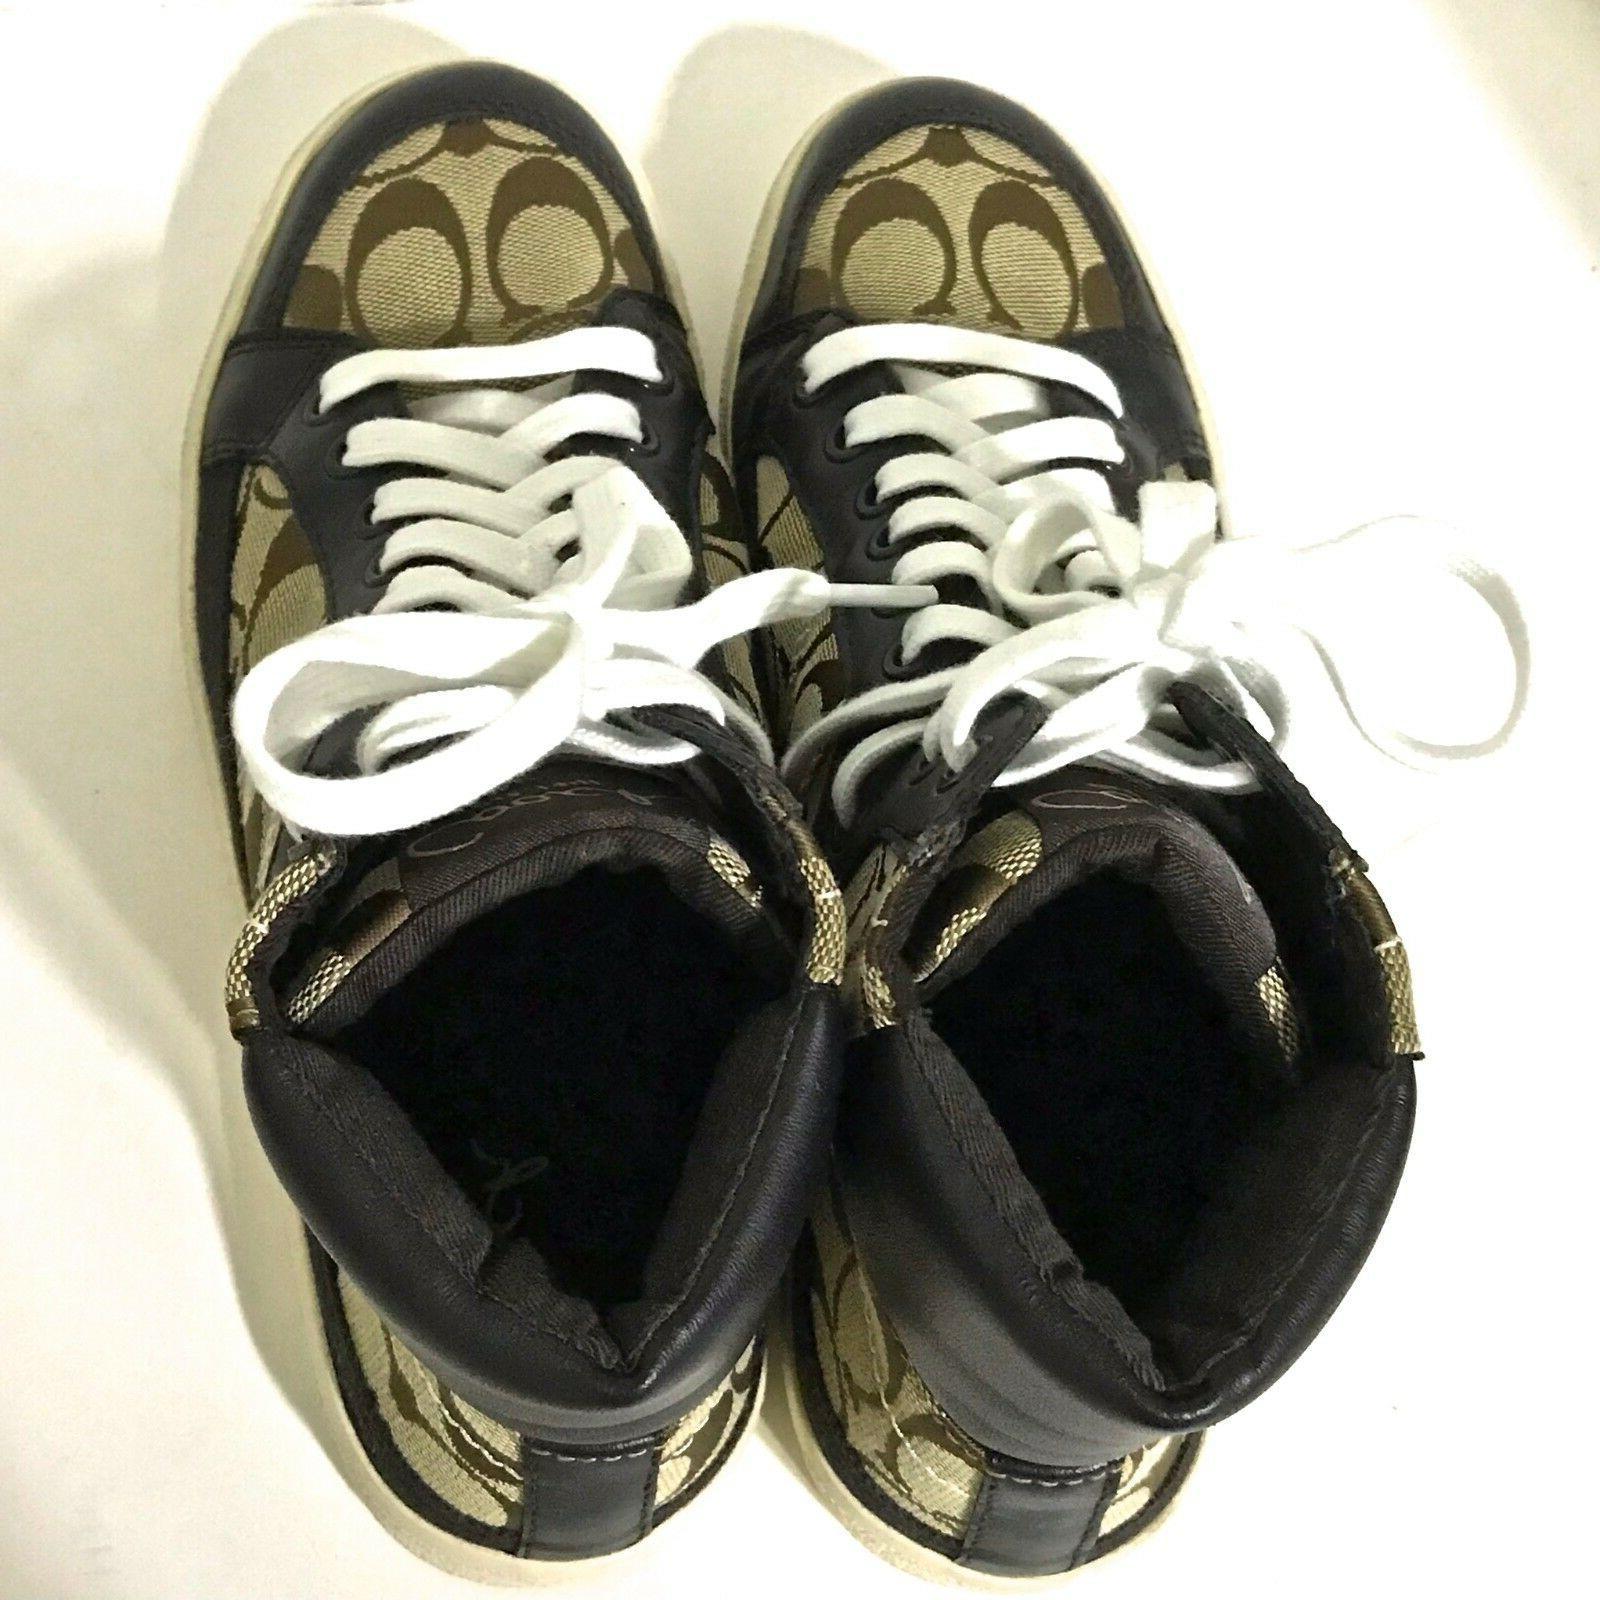 NWOB Ellis Tops Shoes Size 8.5 Brown/Tan ~ NEVER /